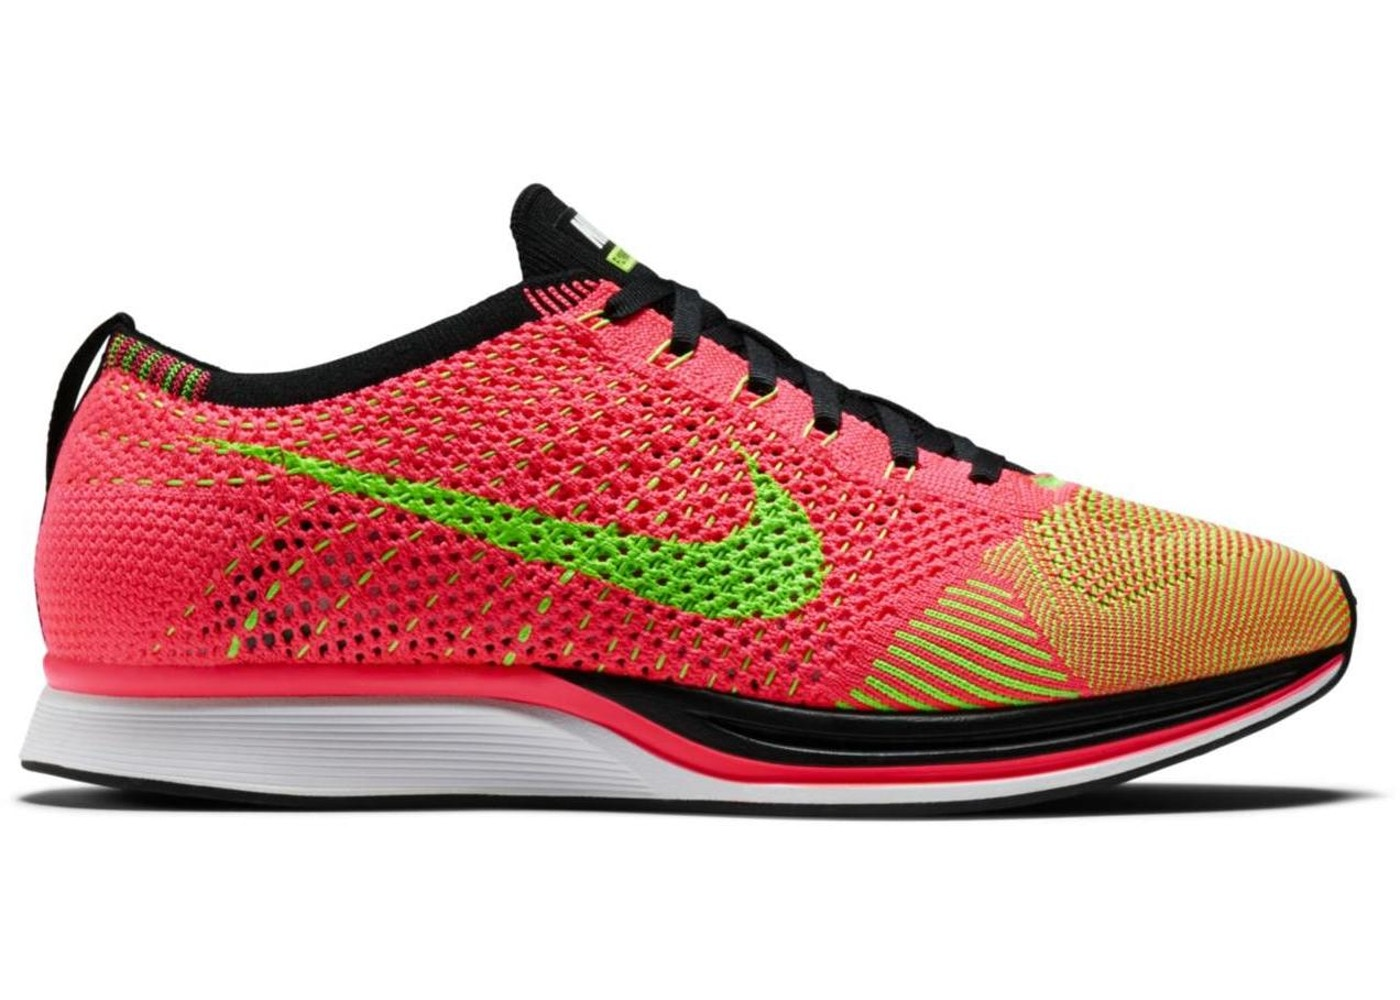 promo code f8d1a e8e3f Nike Flyknit Racer Hyper Punch - 526628-603